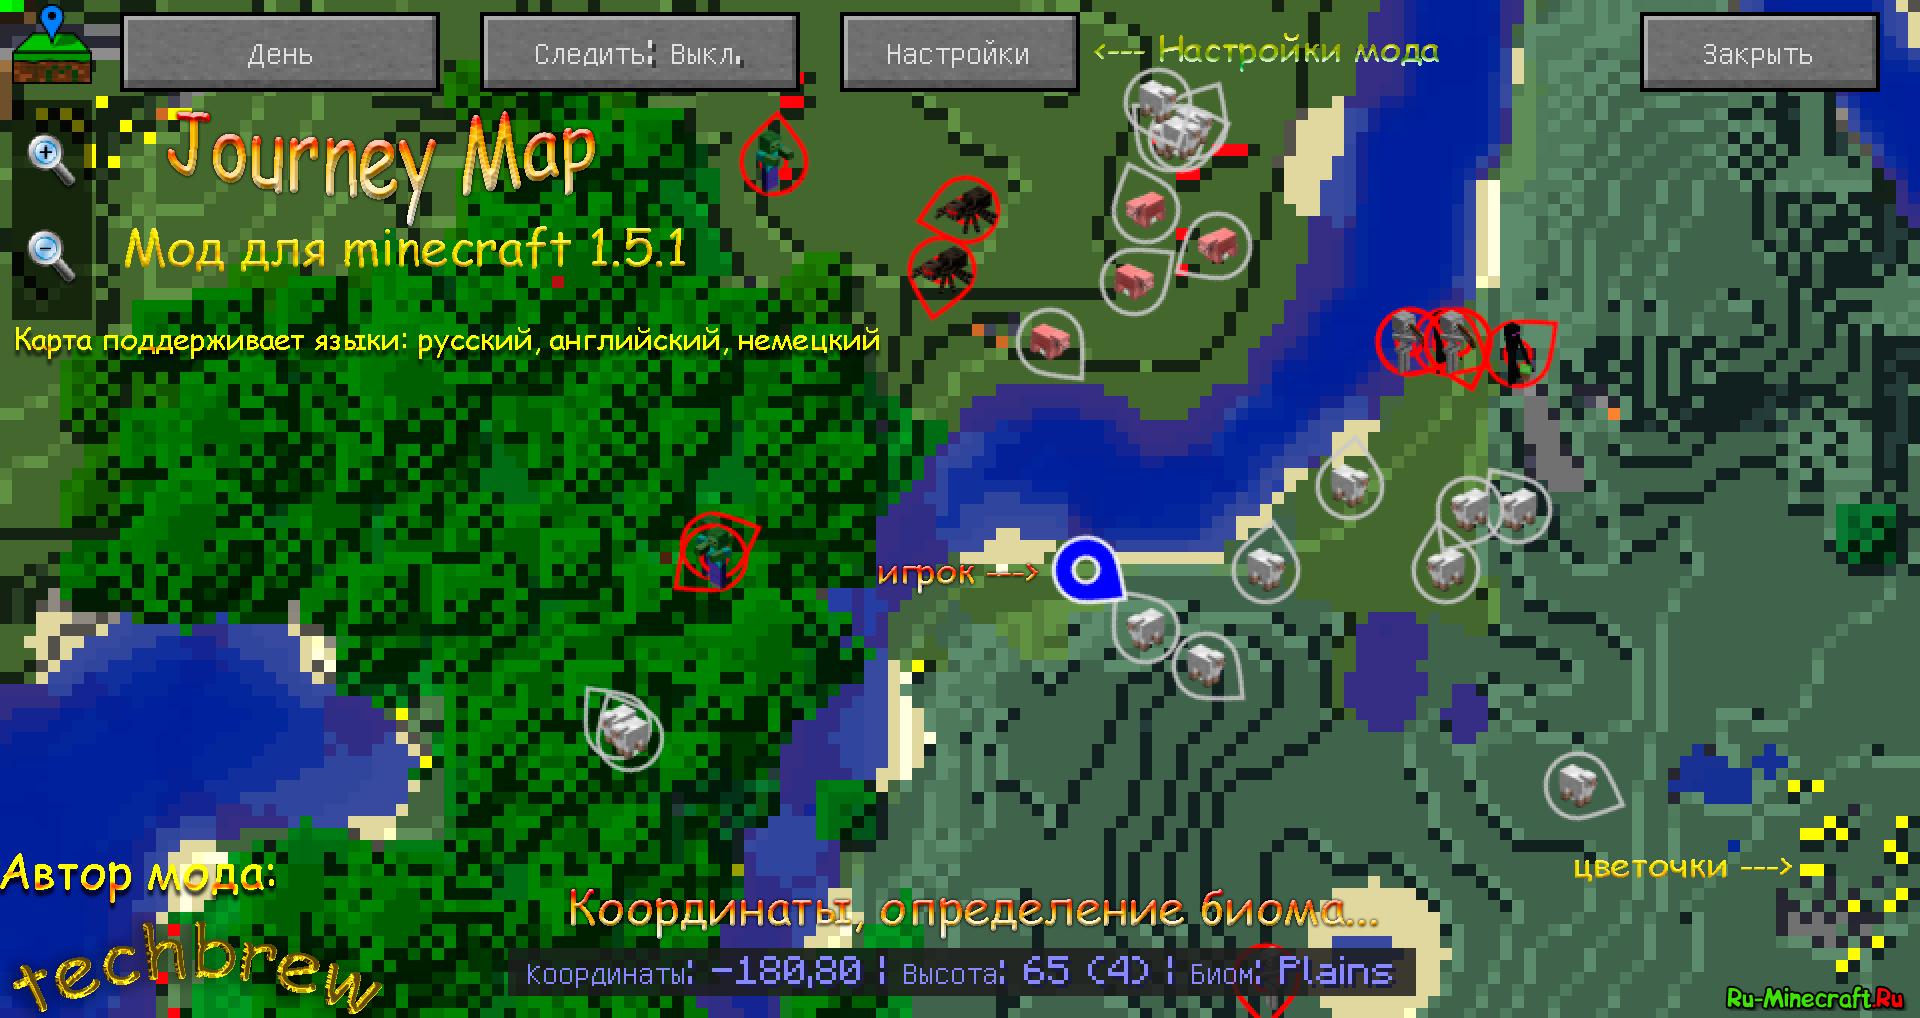 journeymap  Просмотри карту мира » Моды для майнкрафт  -  journeymap  Просмотри карту мира